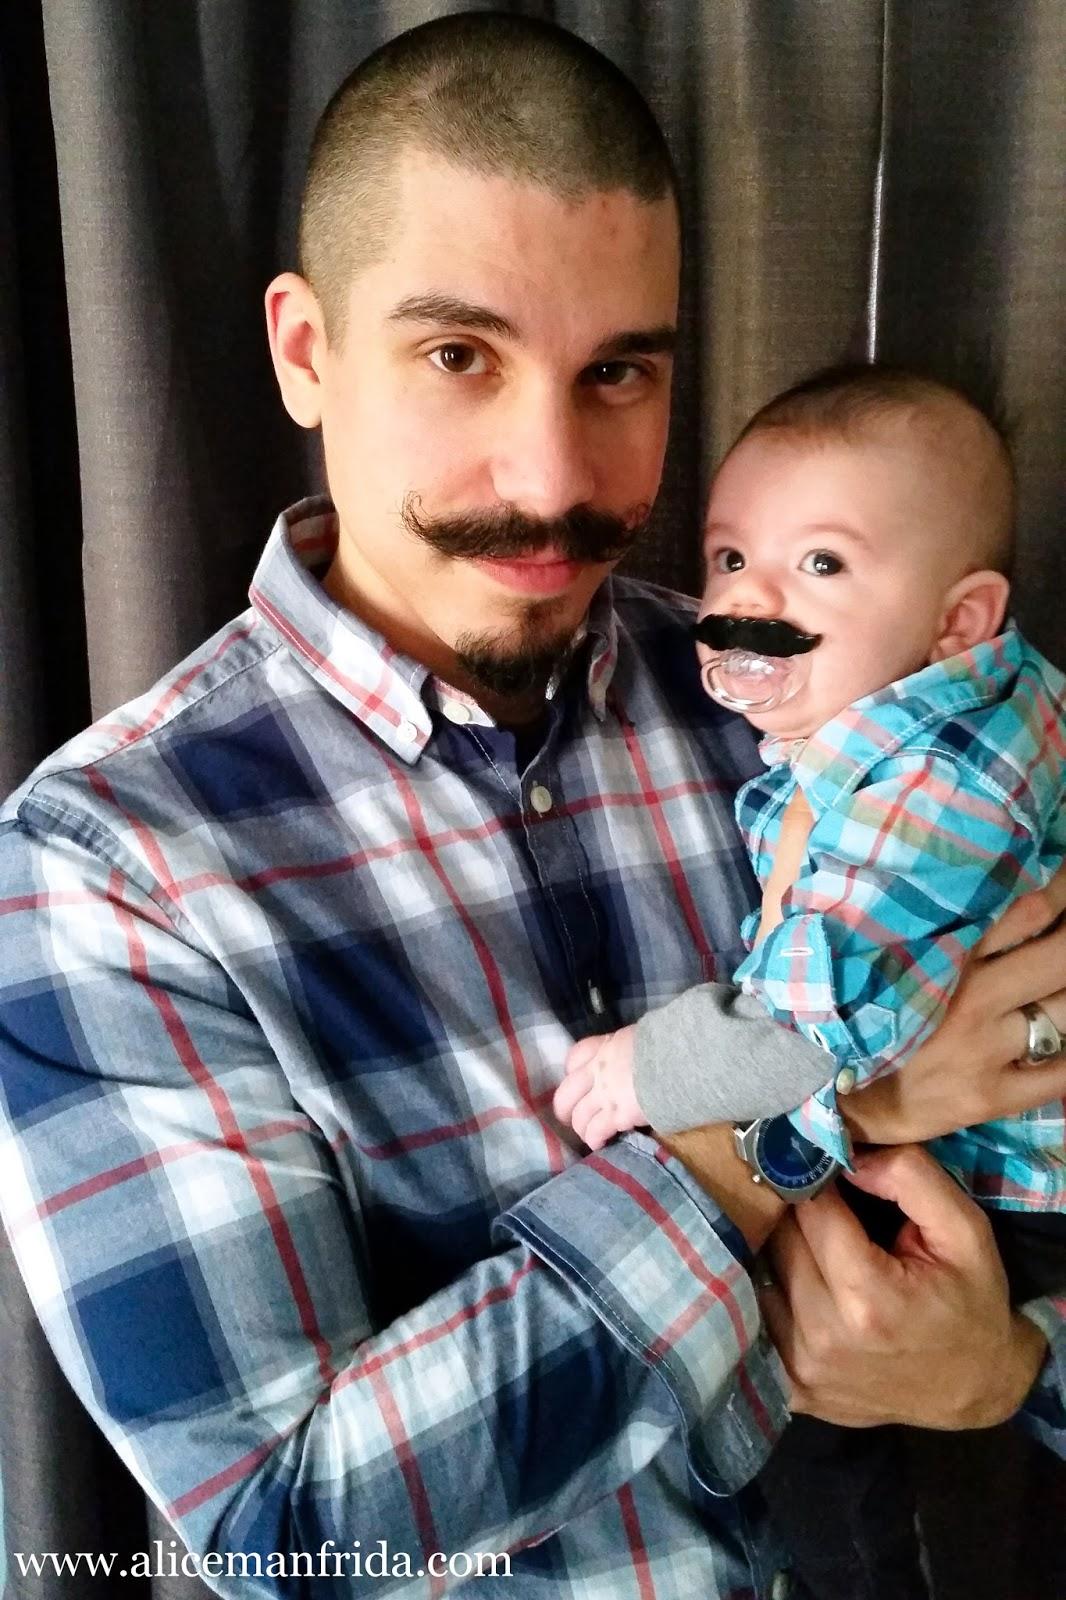 alice manfrida: baby boy halloween costumes